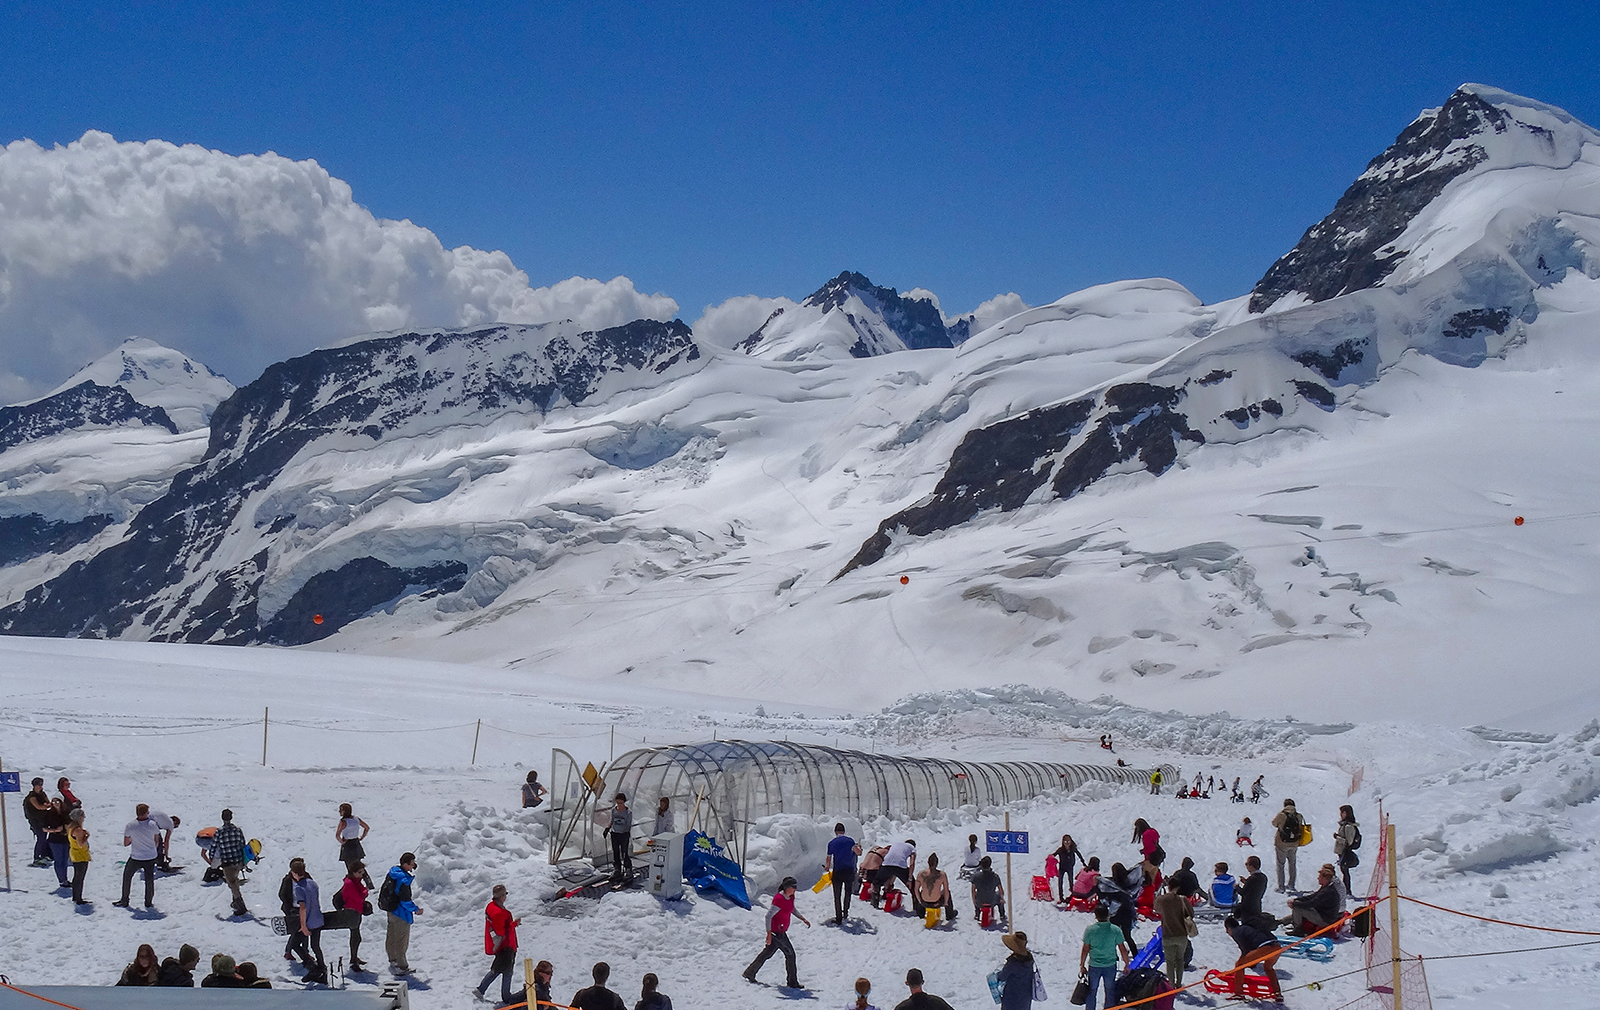 Wintersport am Jungfraujoch